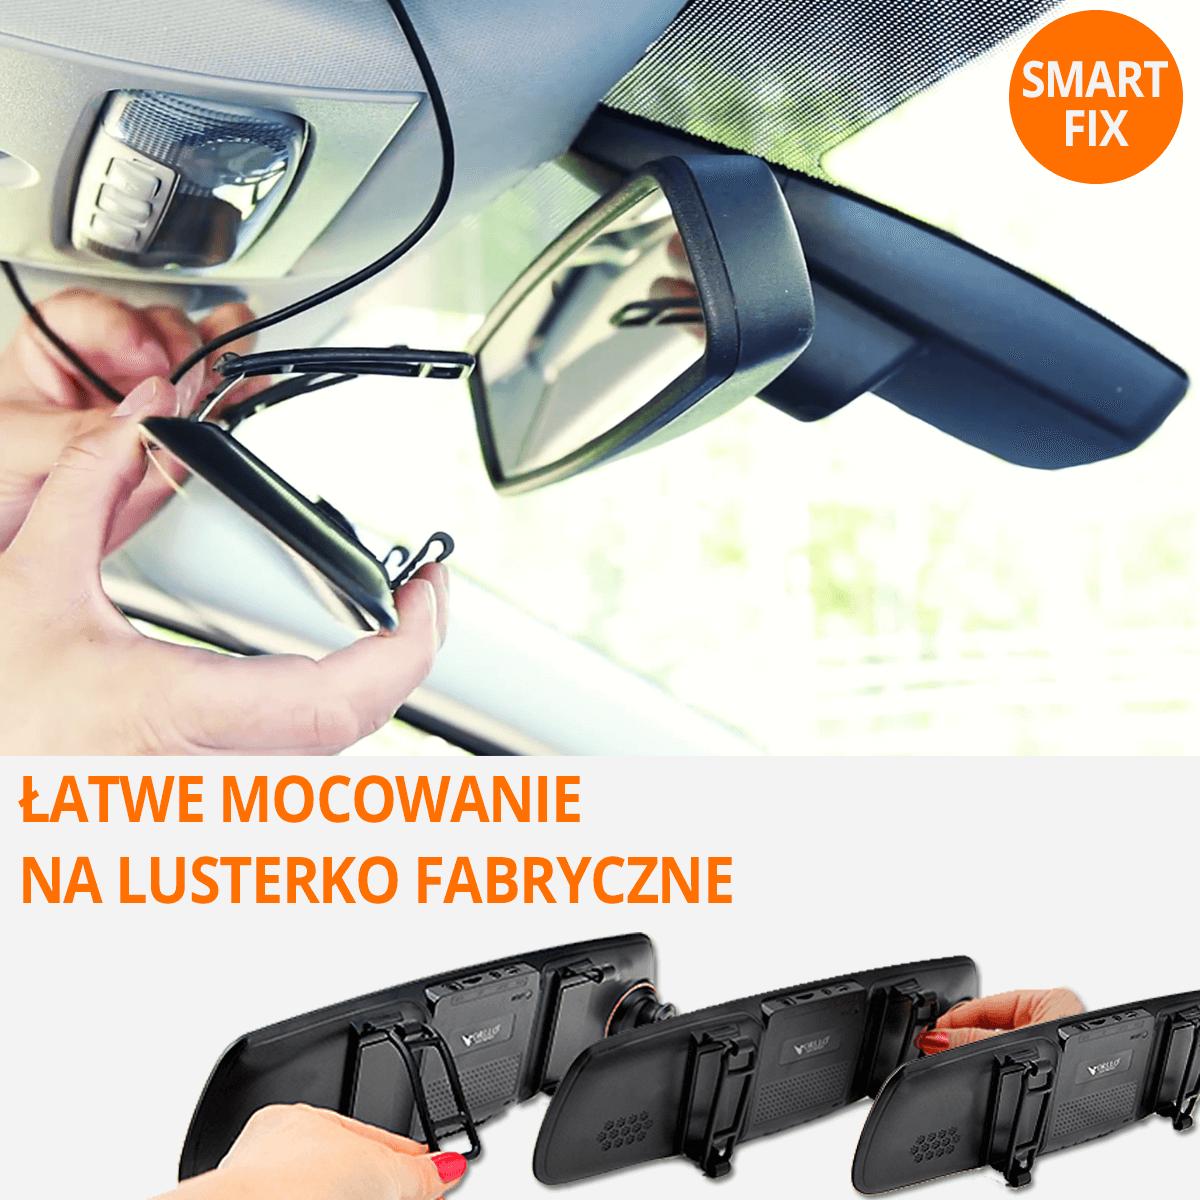 Kamera-samochodowa-LX40DUAL-smartfix-orllo-pl